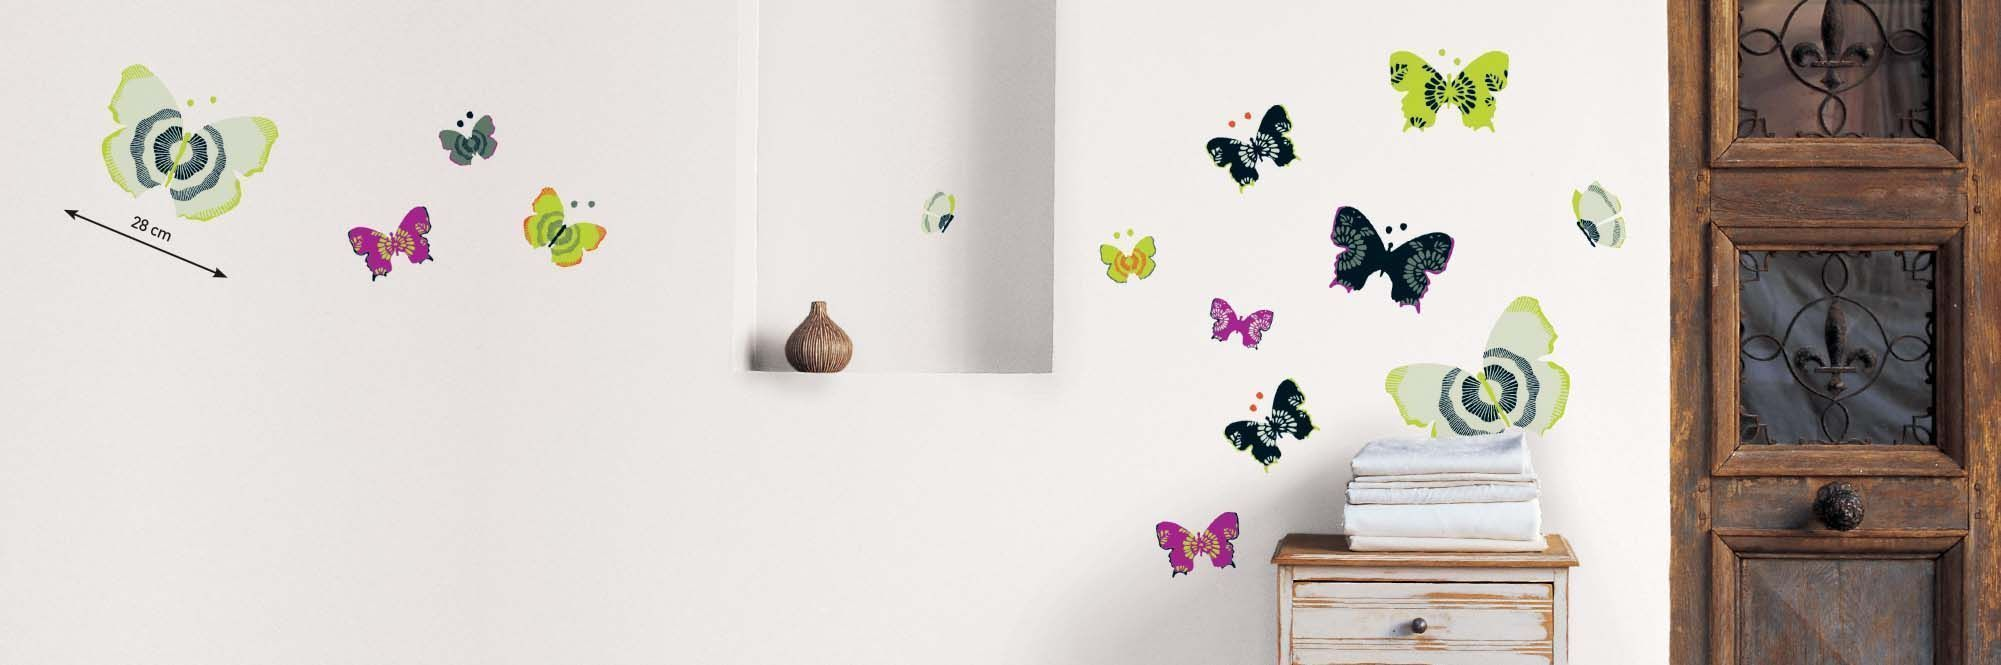 sticker mural papillon. Black Bedroom Furniture Sets. Home Design Ideas